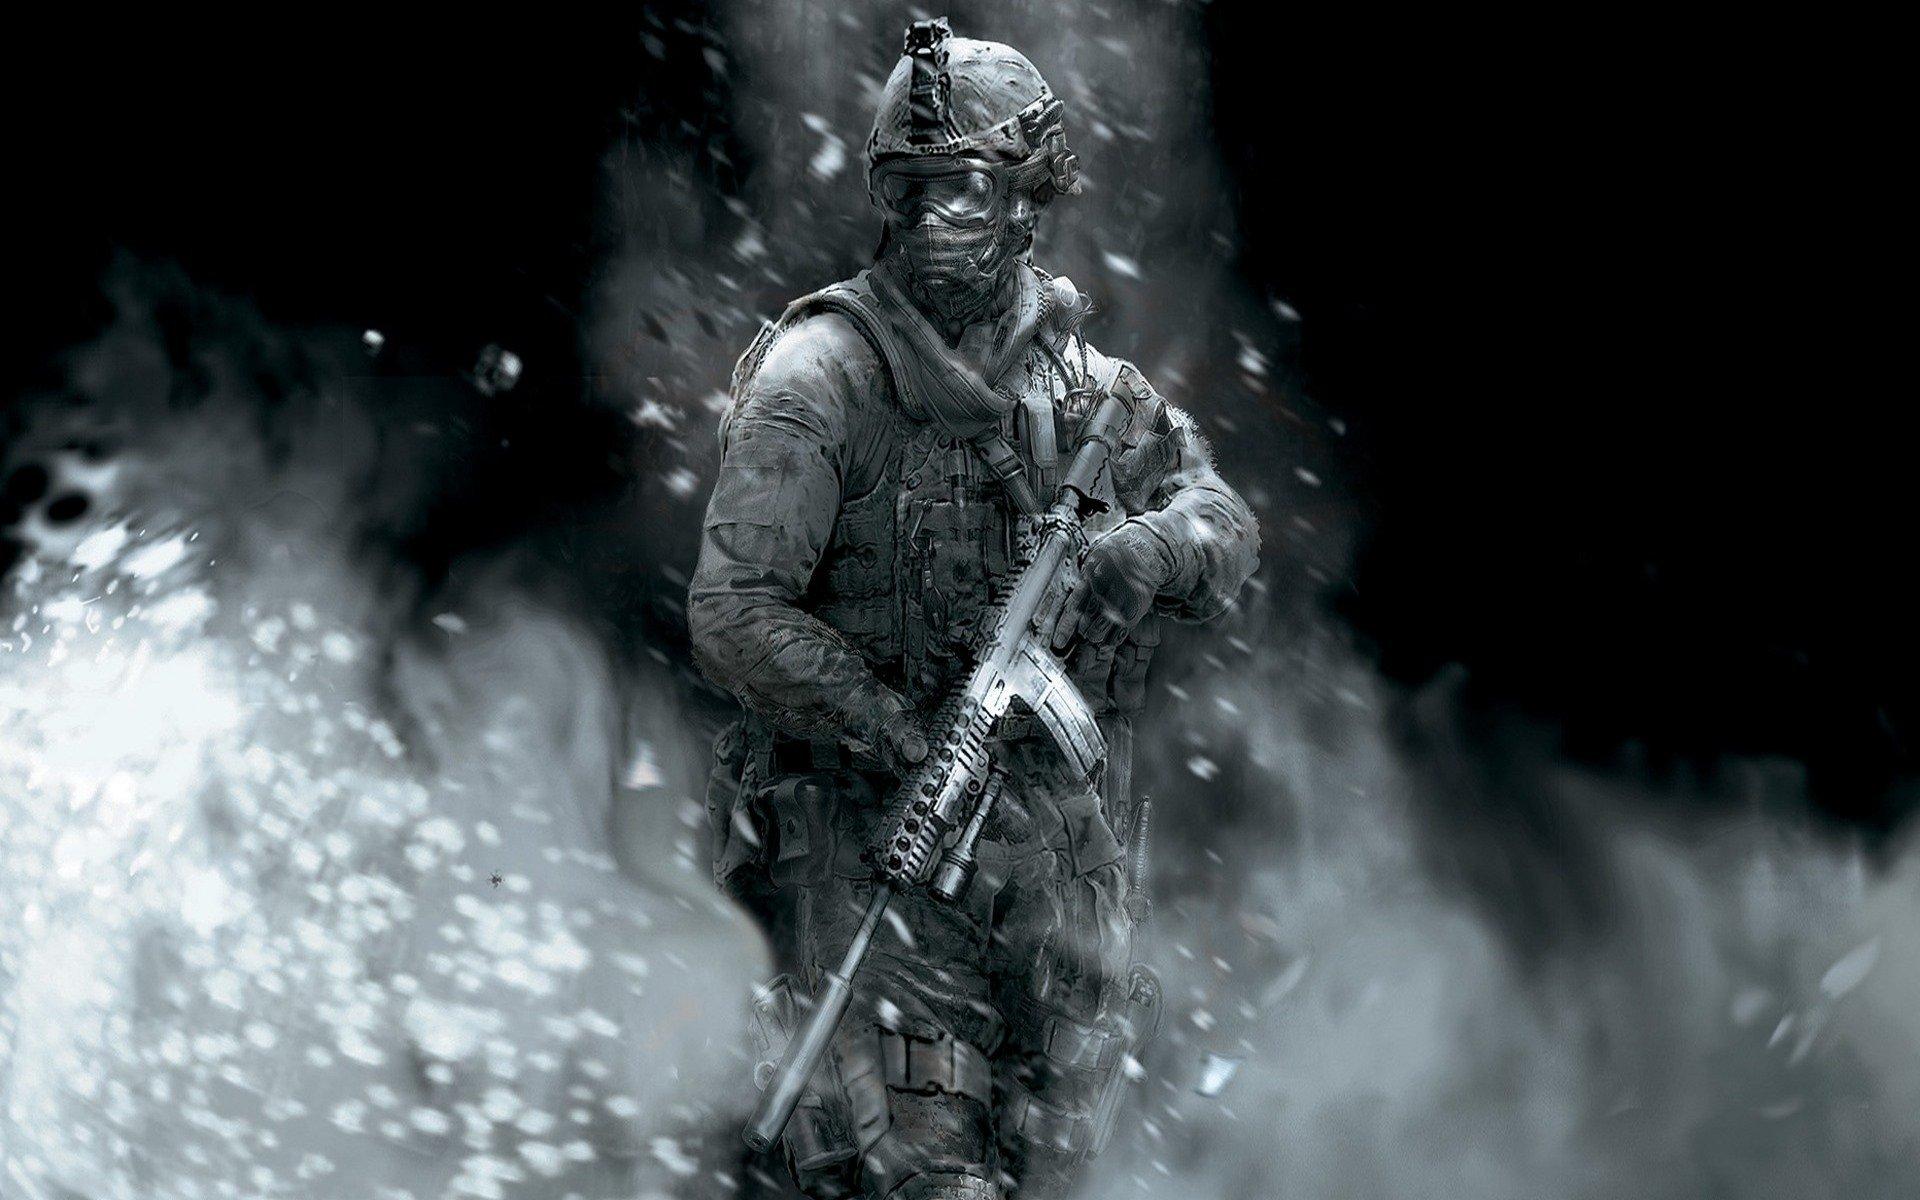 Call Of Duty Modern Warfare 2 Hd Wallpaper Background Image